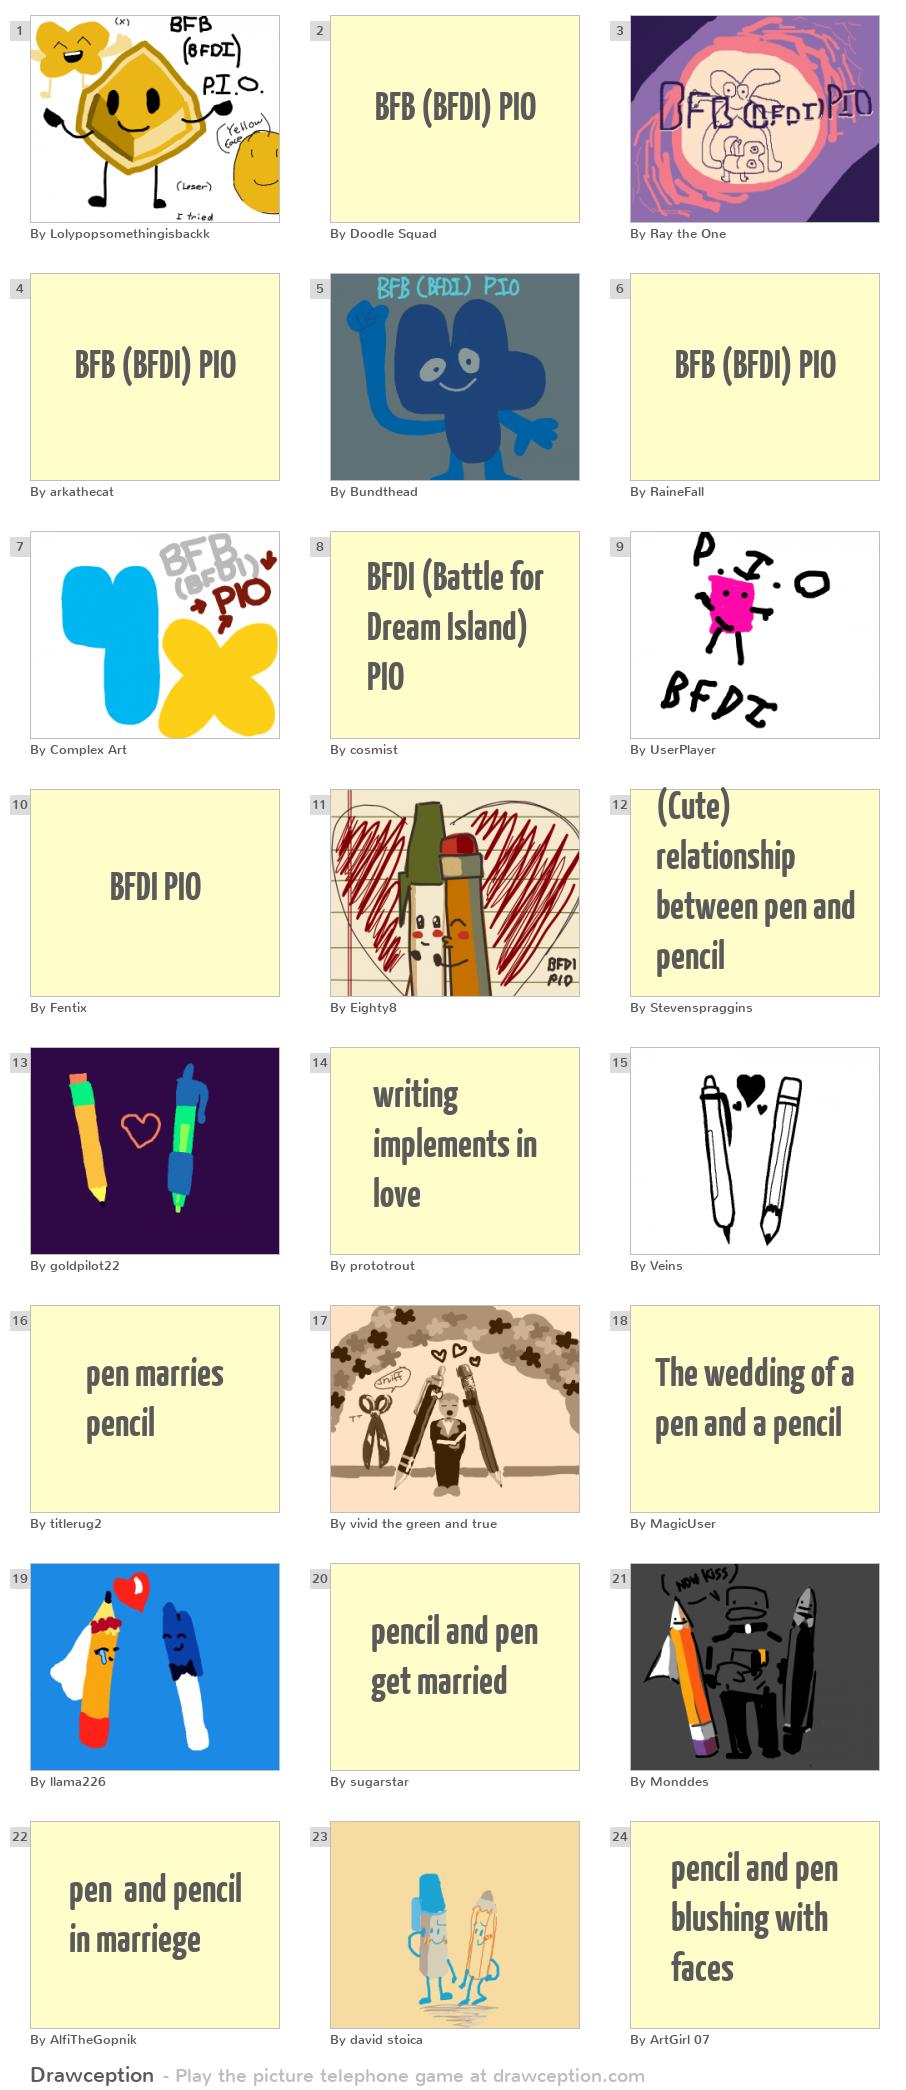 BFB (BFDI) PIO - Drawception